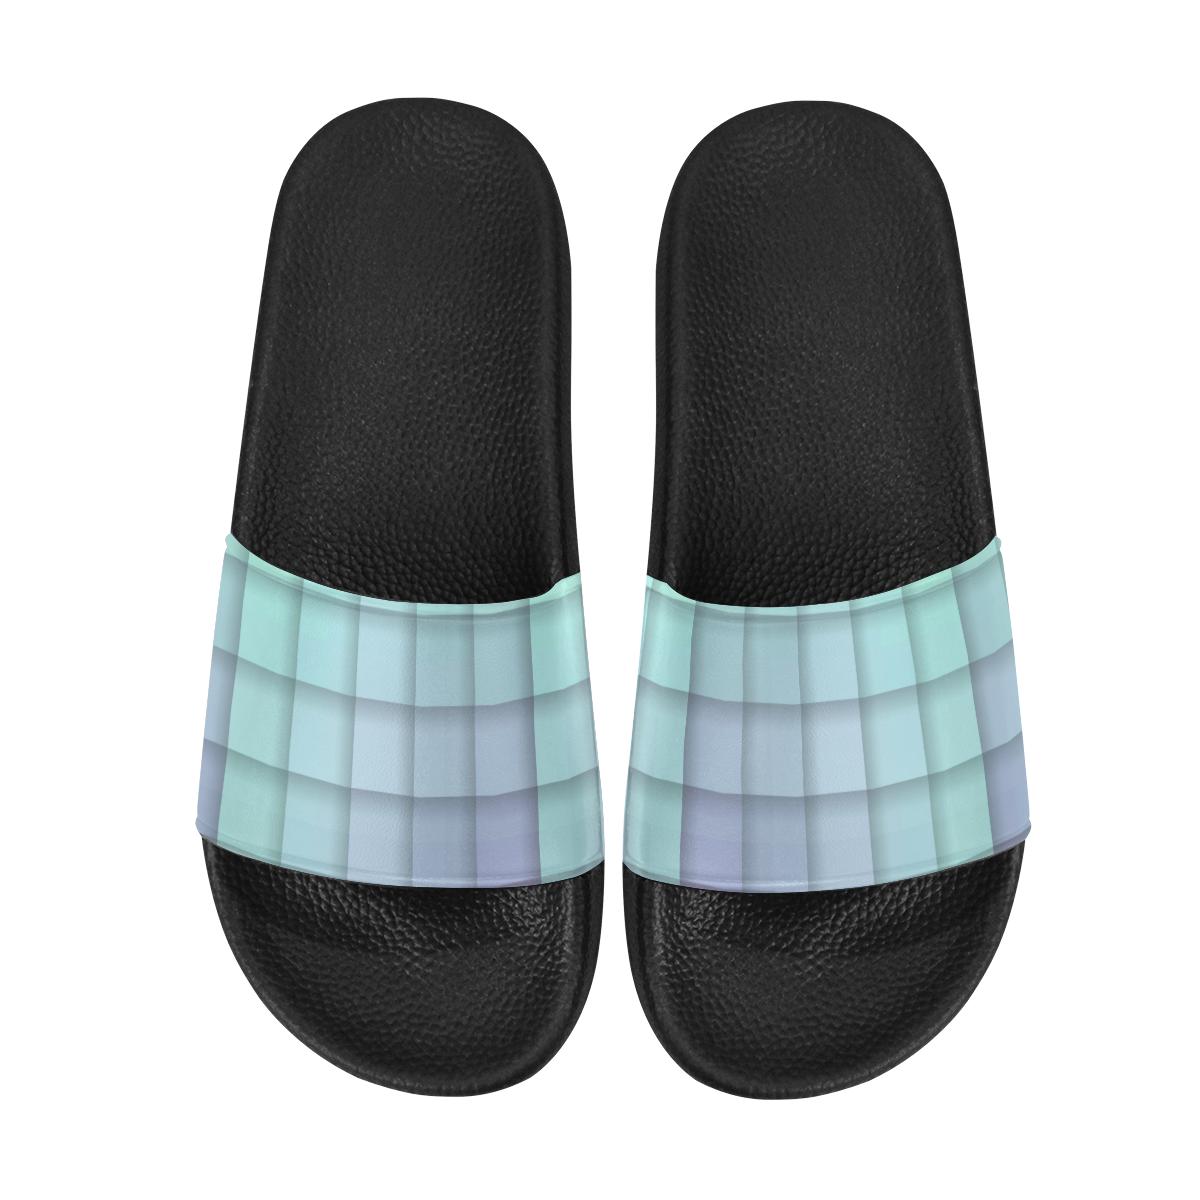 Glass Mosaic Mint Green and Violet Geometric Women's Slide Sandals (Model 057)